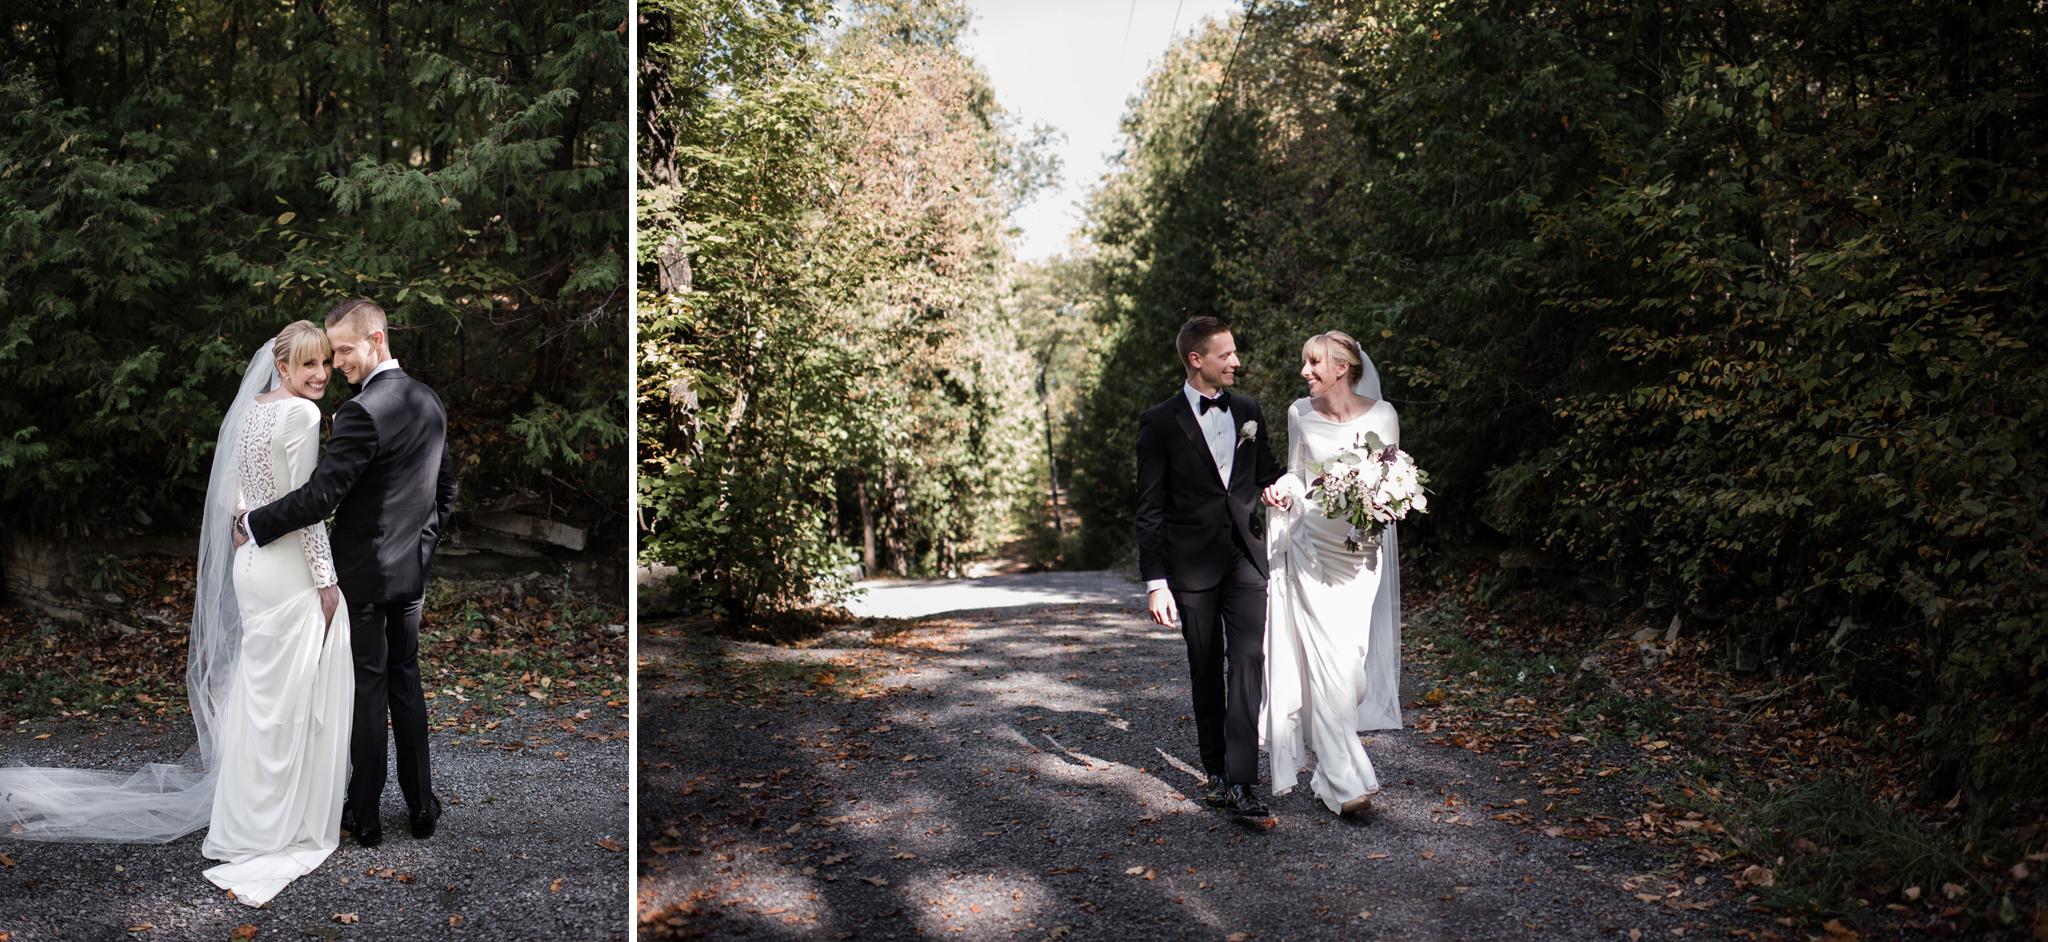 049-wedding-photos-in-forest-ontario-cottage-toronto.jpg